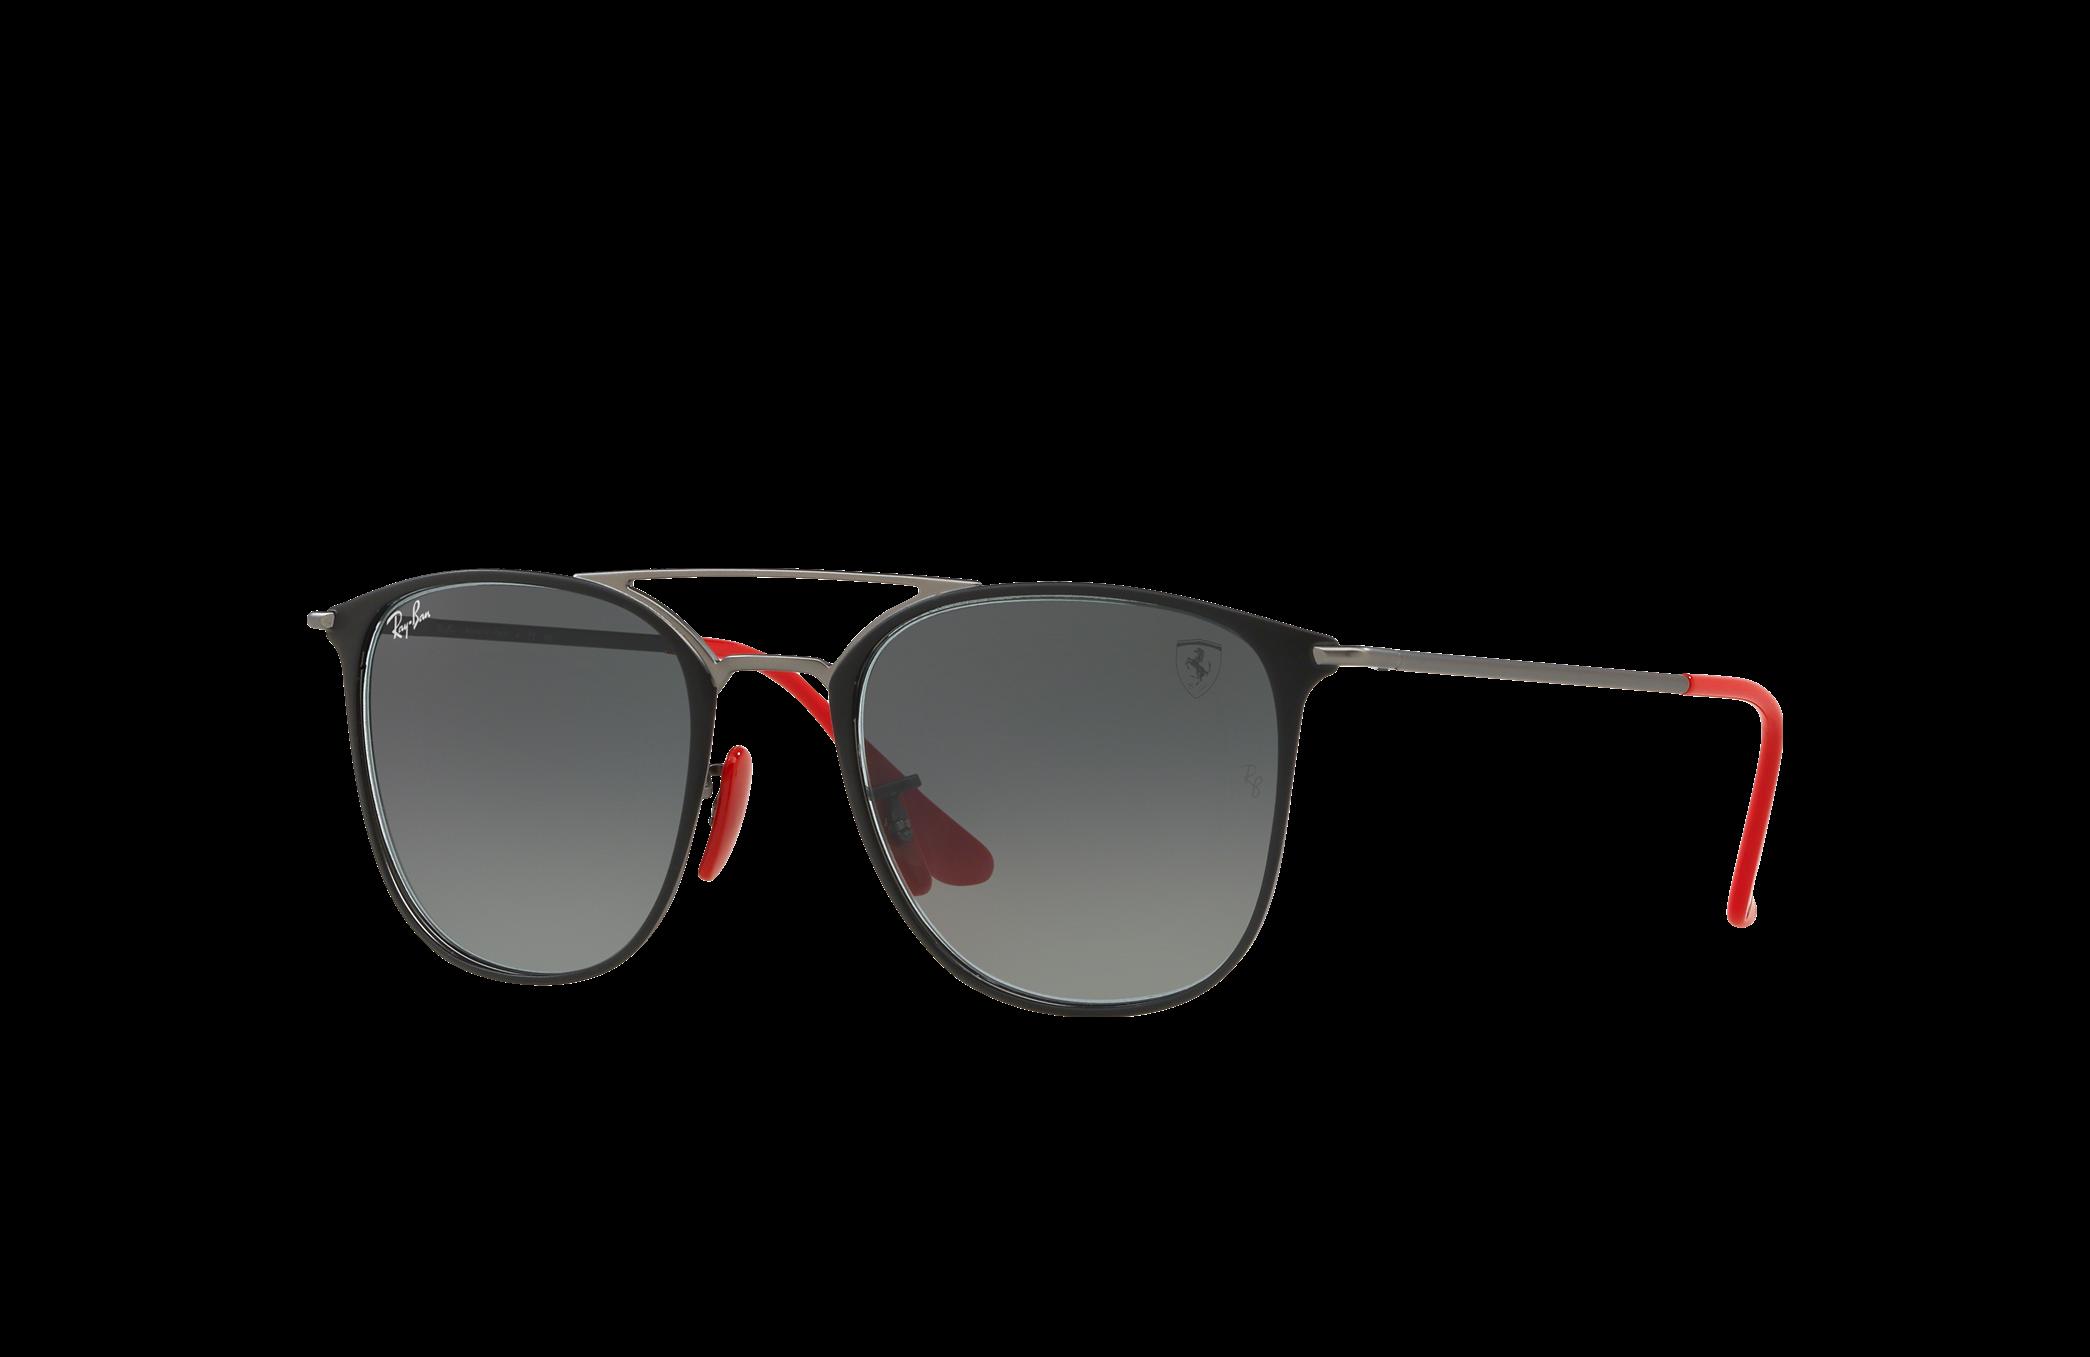 Ray-Ban Scuderia Ferrari Japan Limited Edition Gunmetal, Gray Lenses - RB3601M